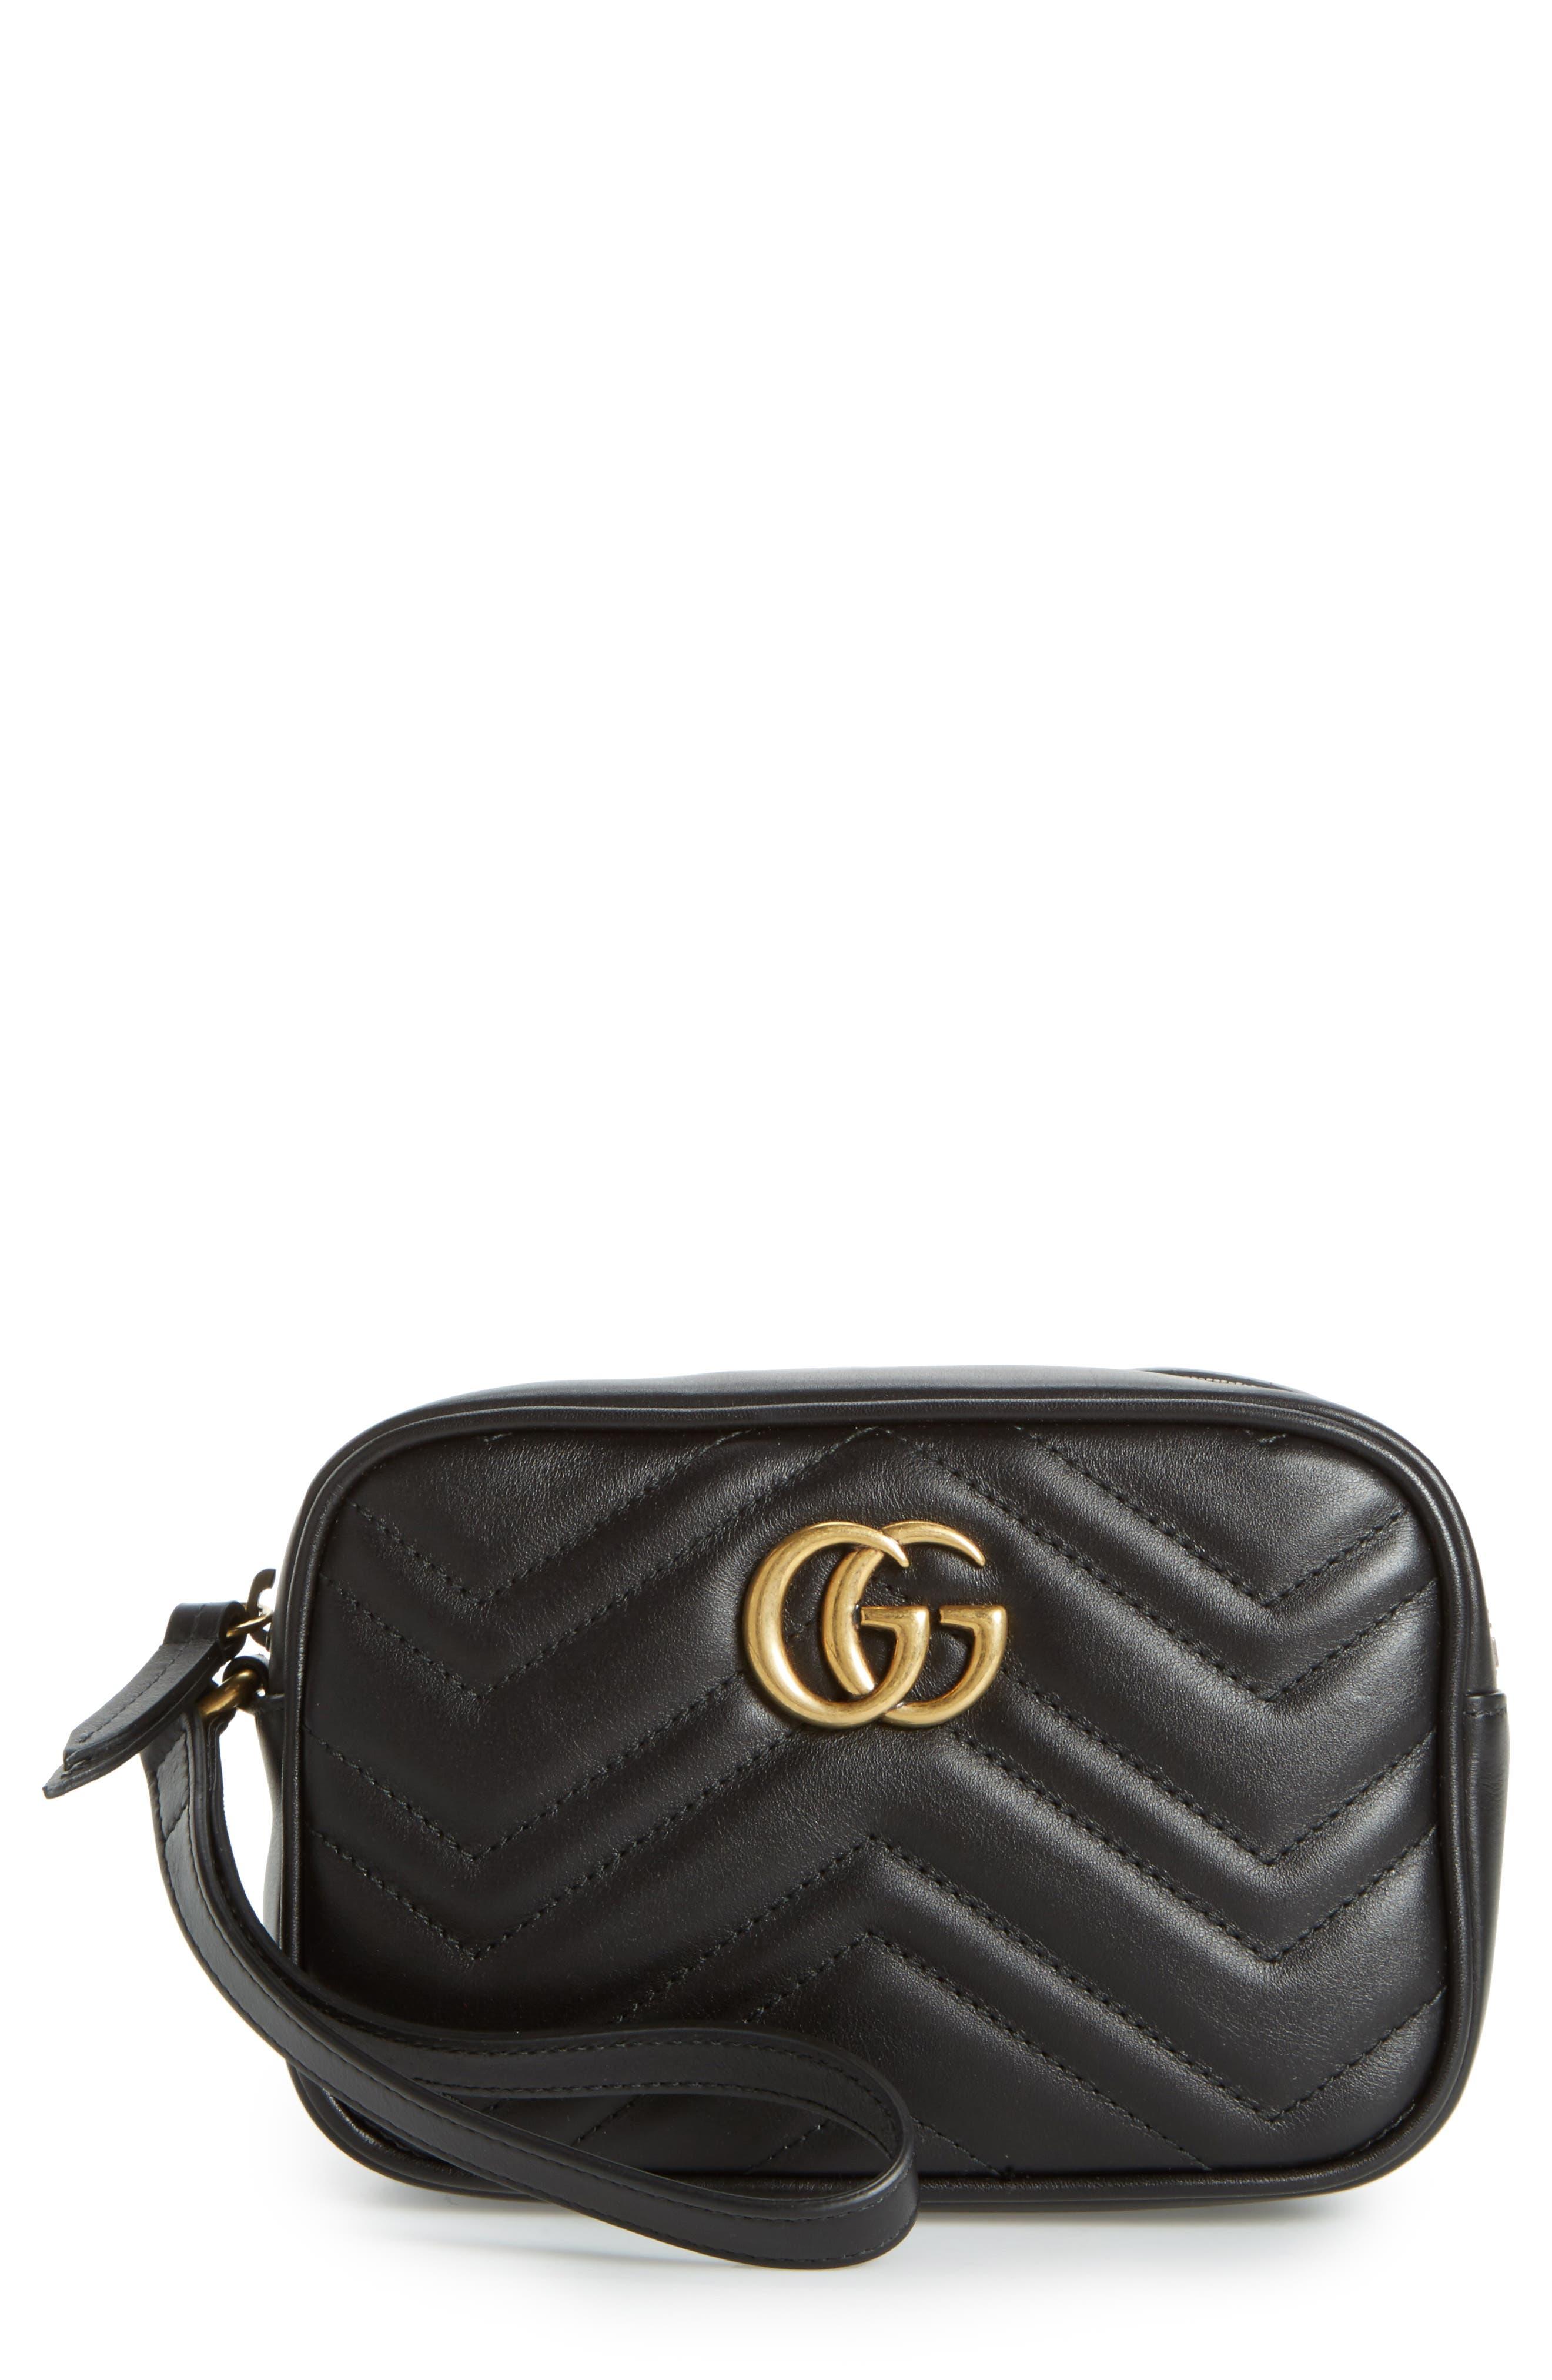 Gucci Mini GG Marmont 2.0 Matelassé Leather Wristlet